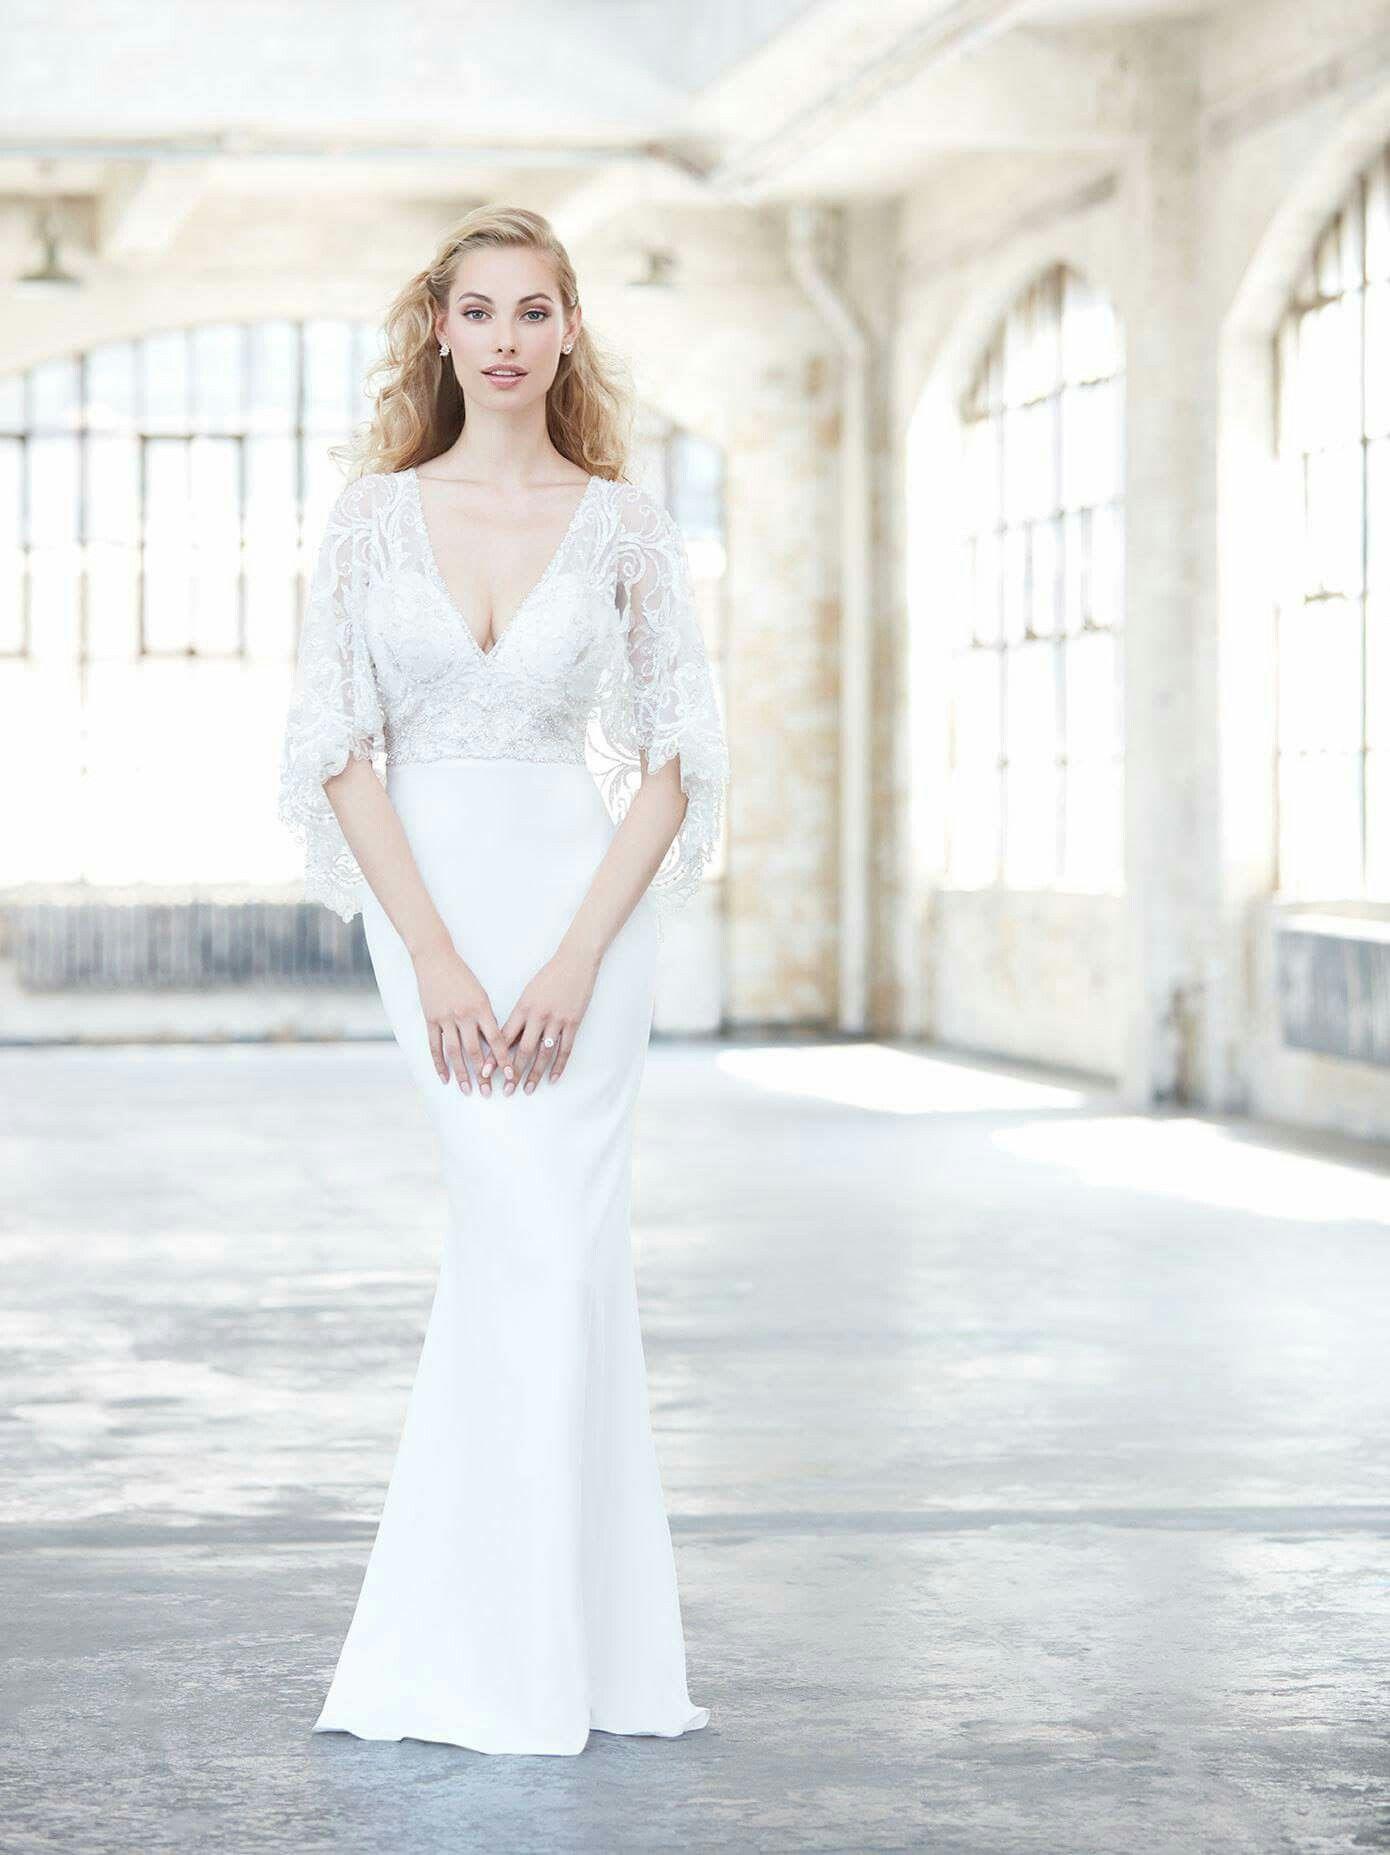 Pin by romiia hamed on bride pinterest wedding dresses wedding